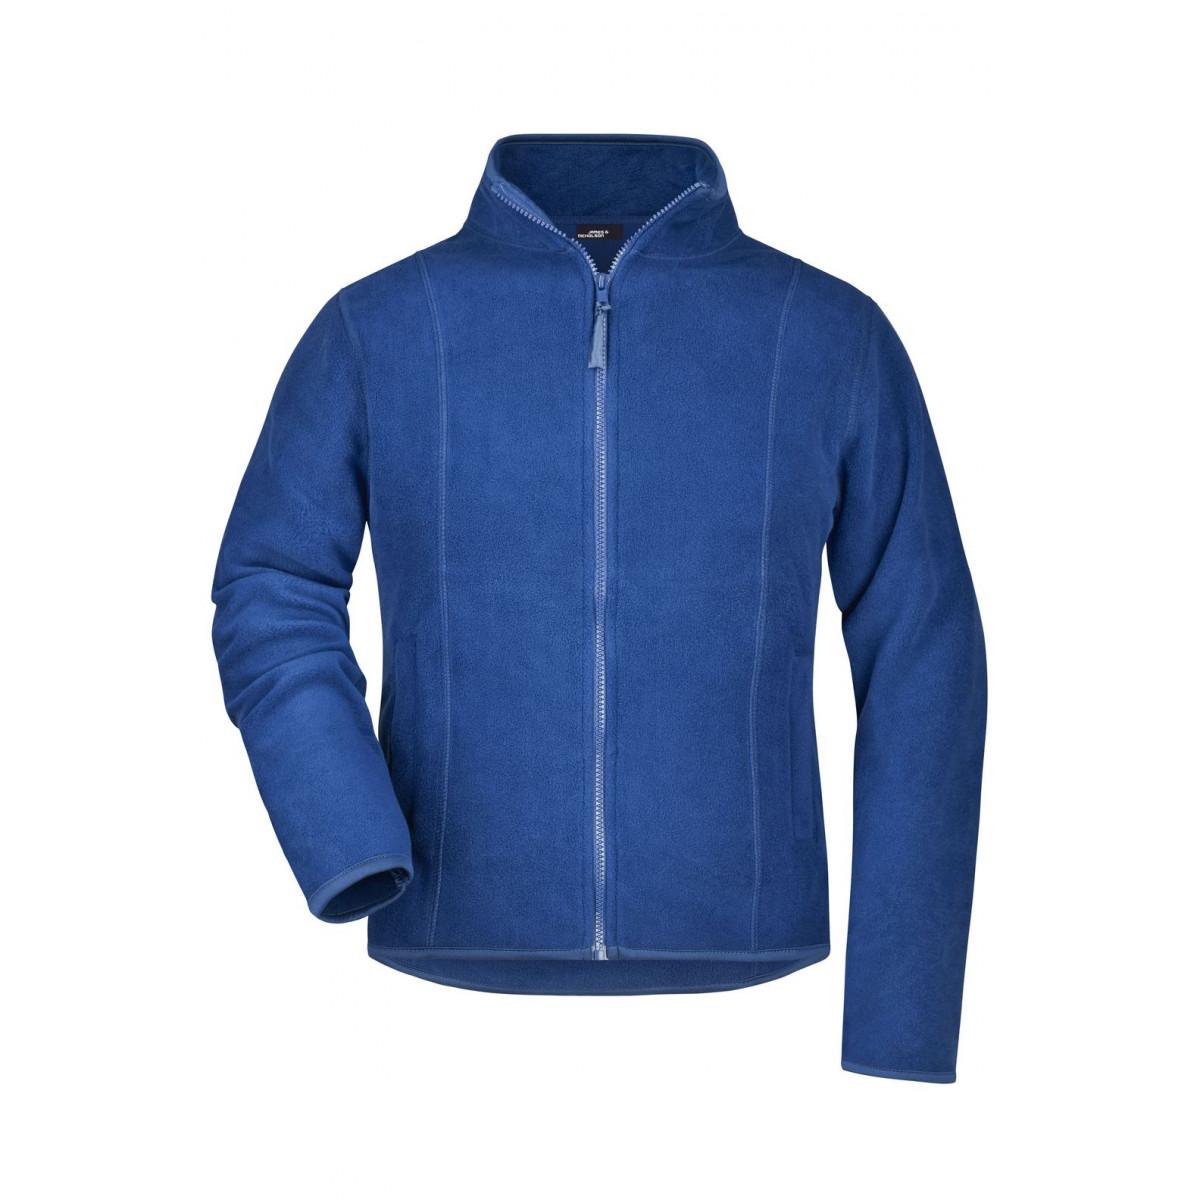 Толстовка женская JN049 Girly Microfleece Jacket - Ярко-синий